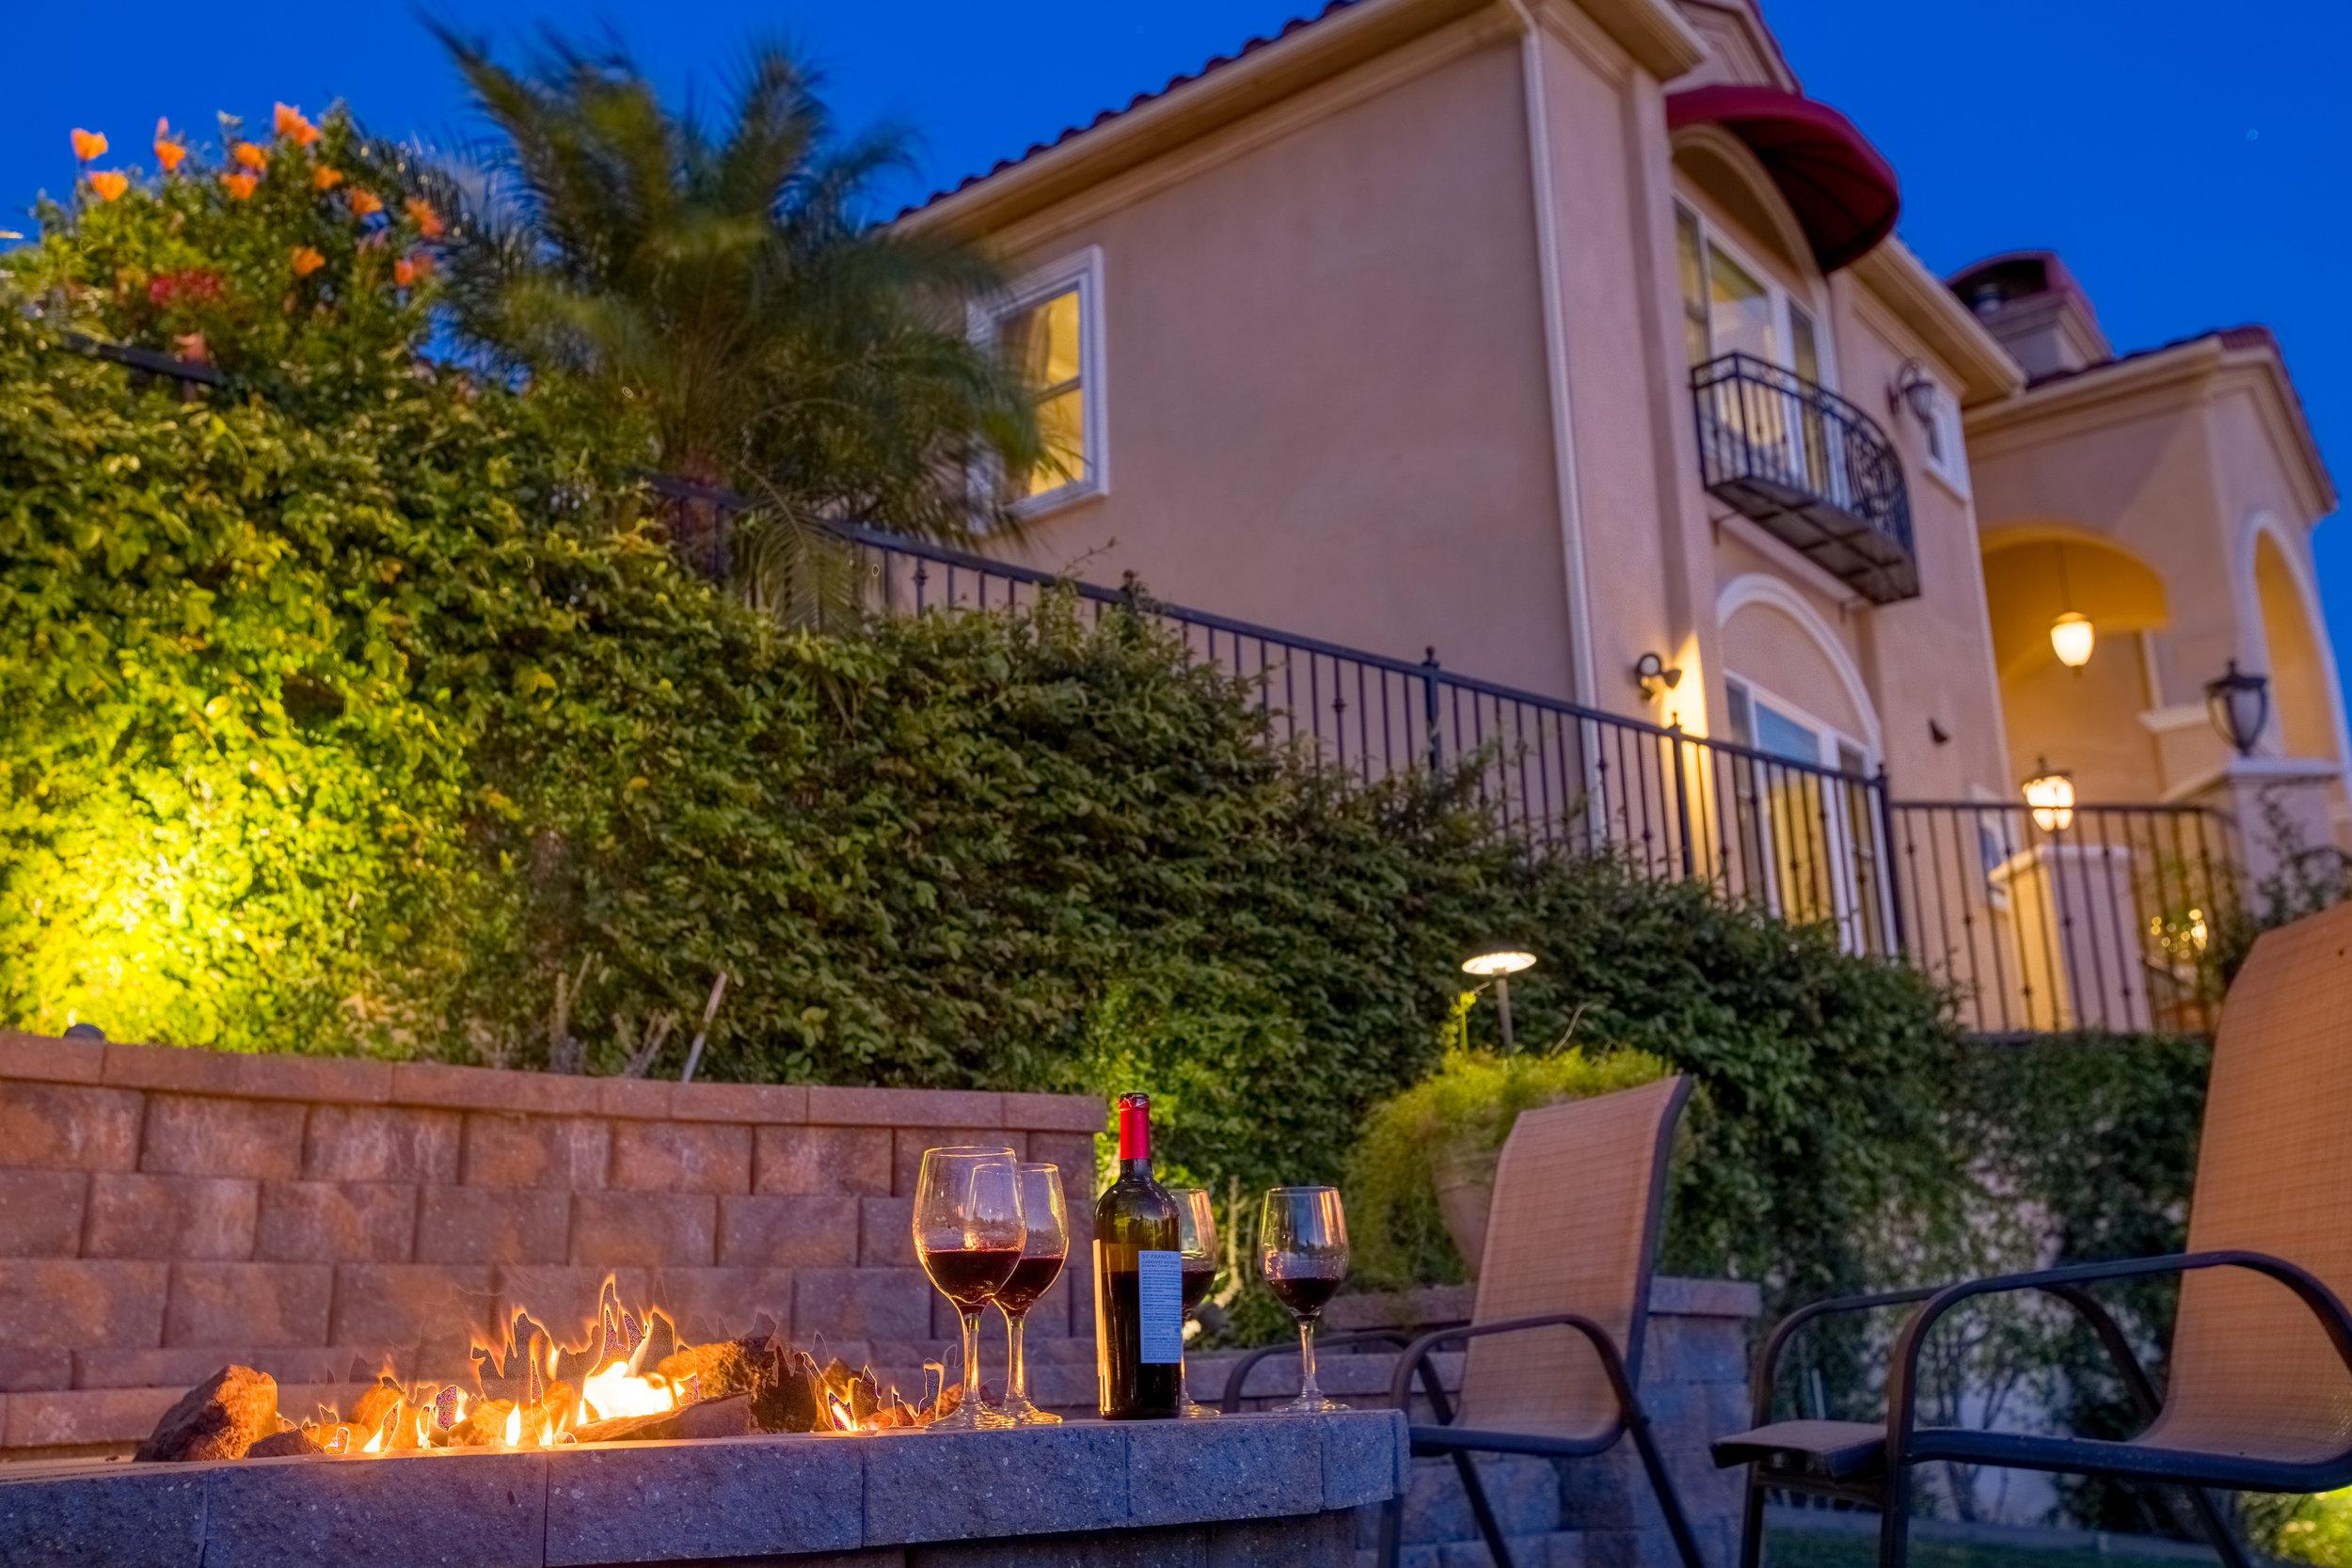 Real Estate Photography of Backyard Patio